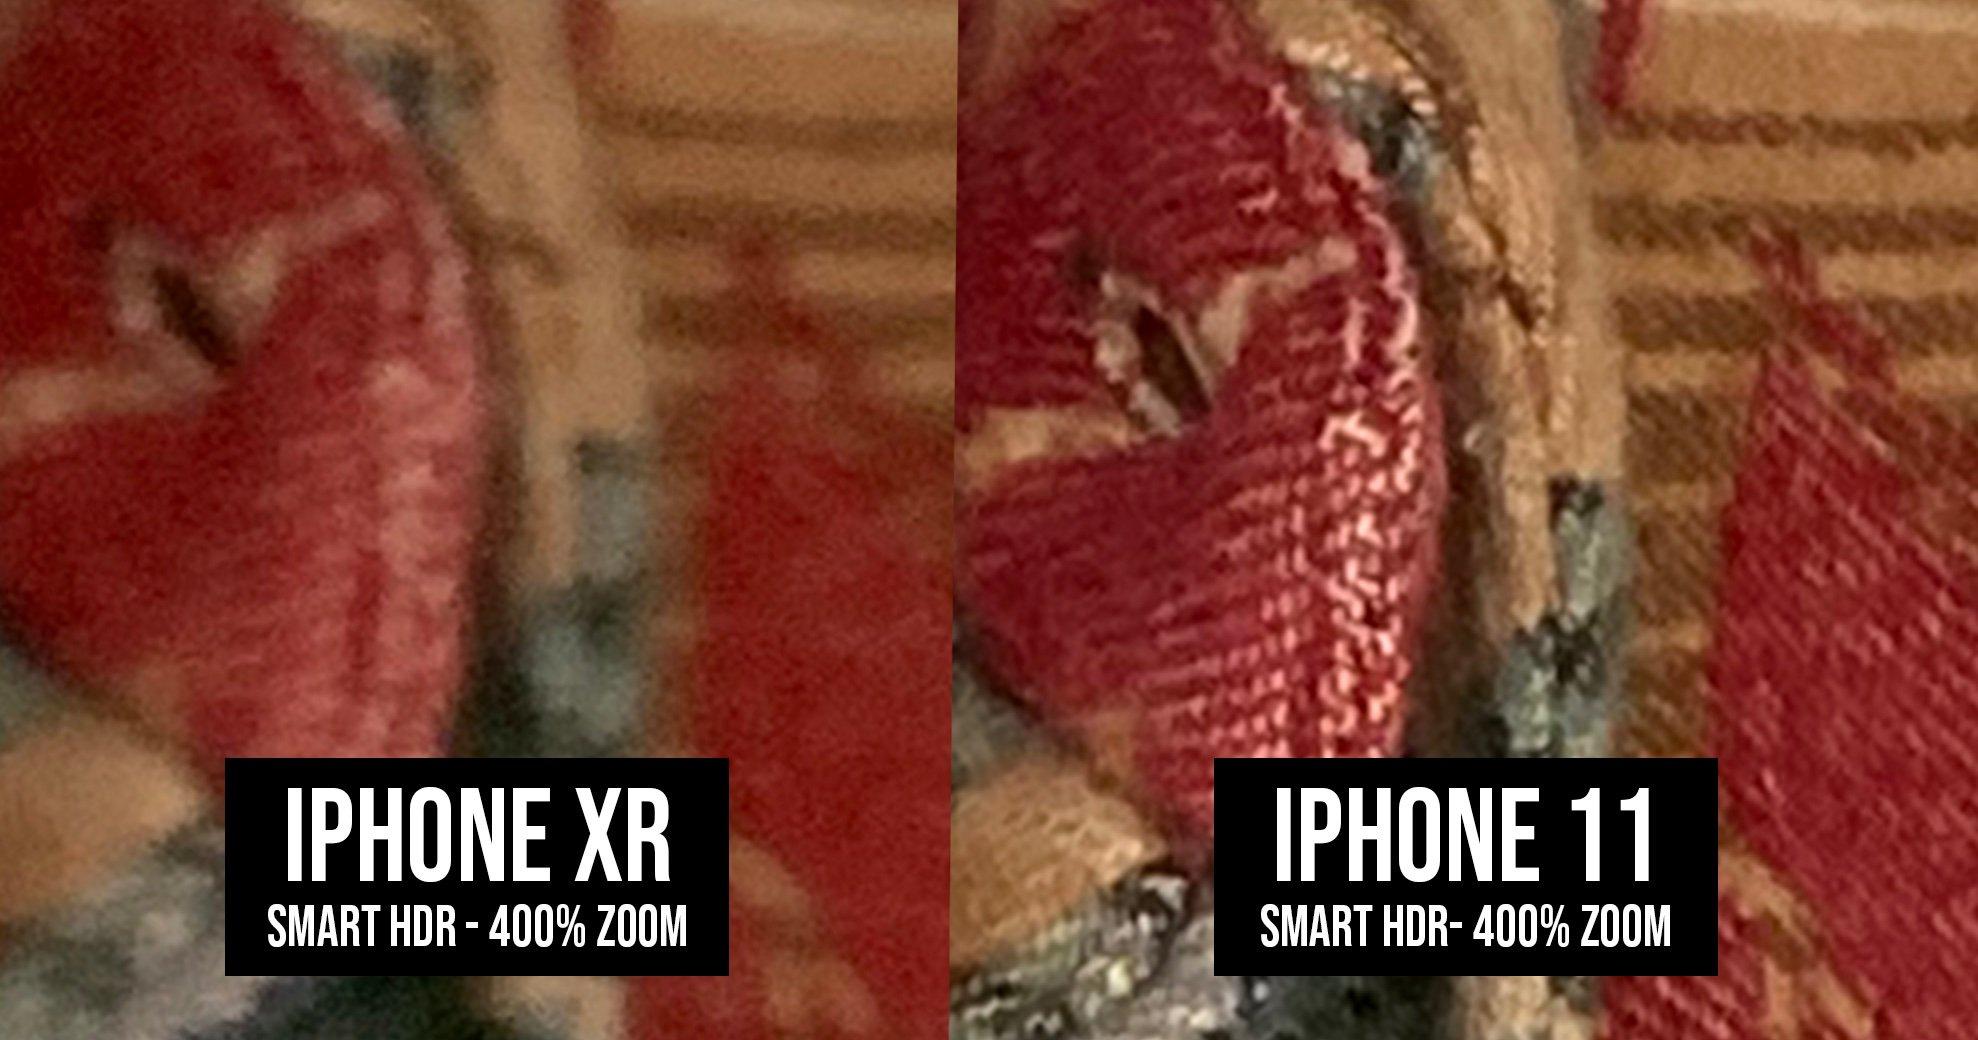 iPhone 11 poza deep fusion obiecte comparatie iphone xr